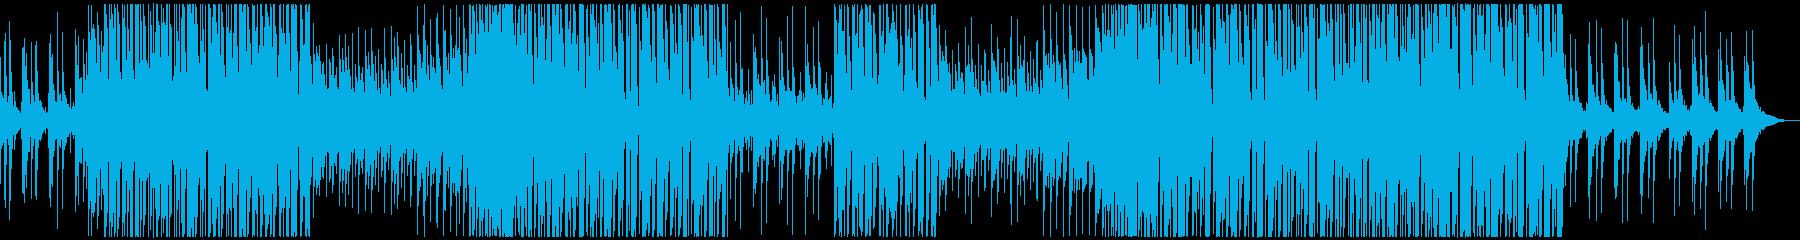 kpop・niziu風・カワイイダンスの再生済みの波形